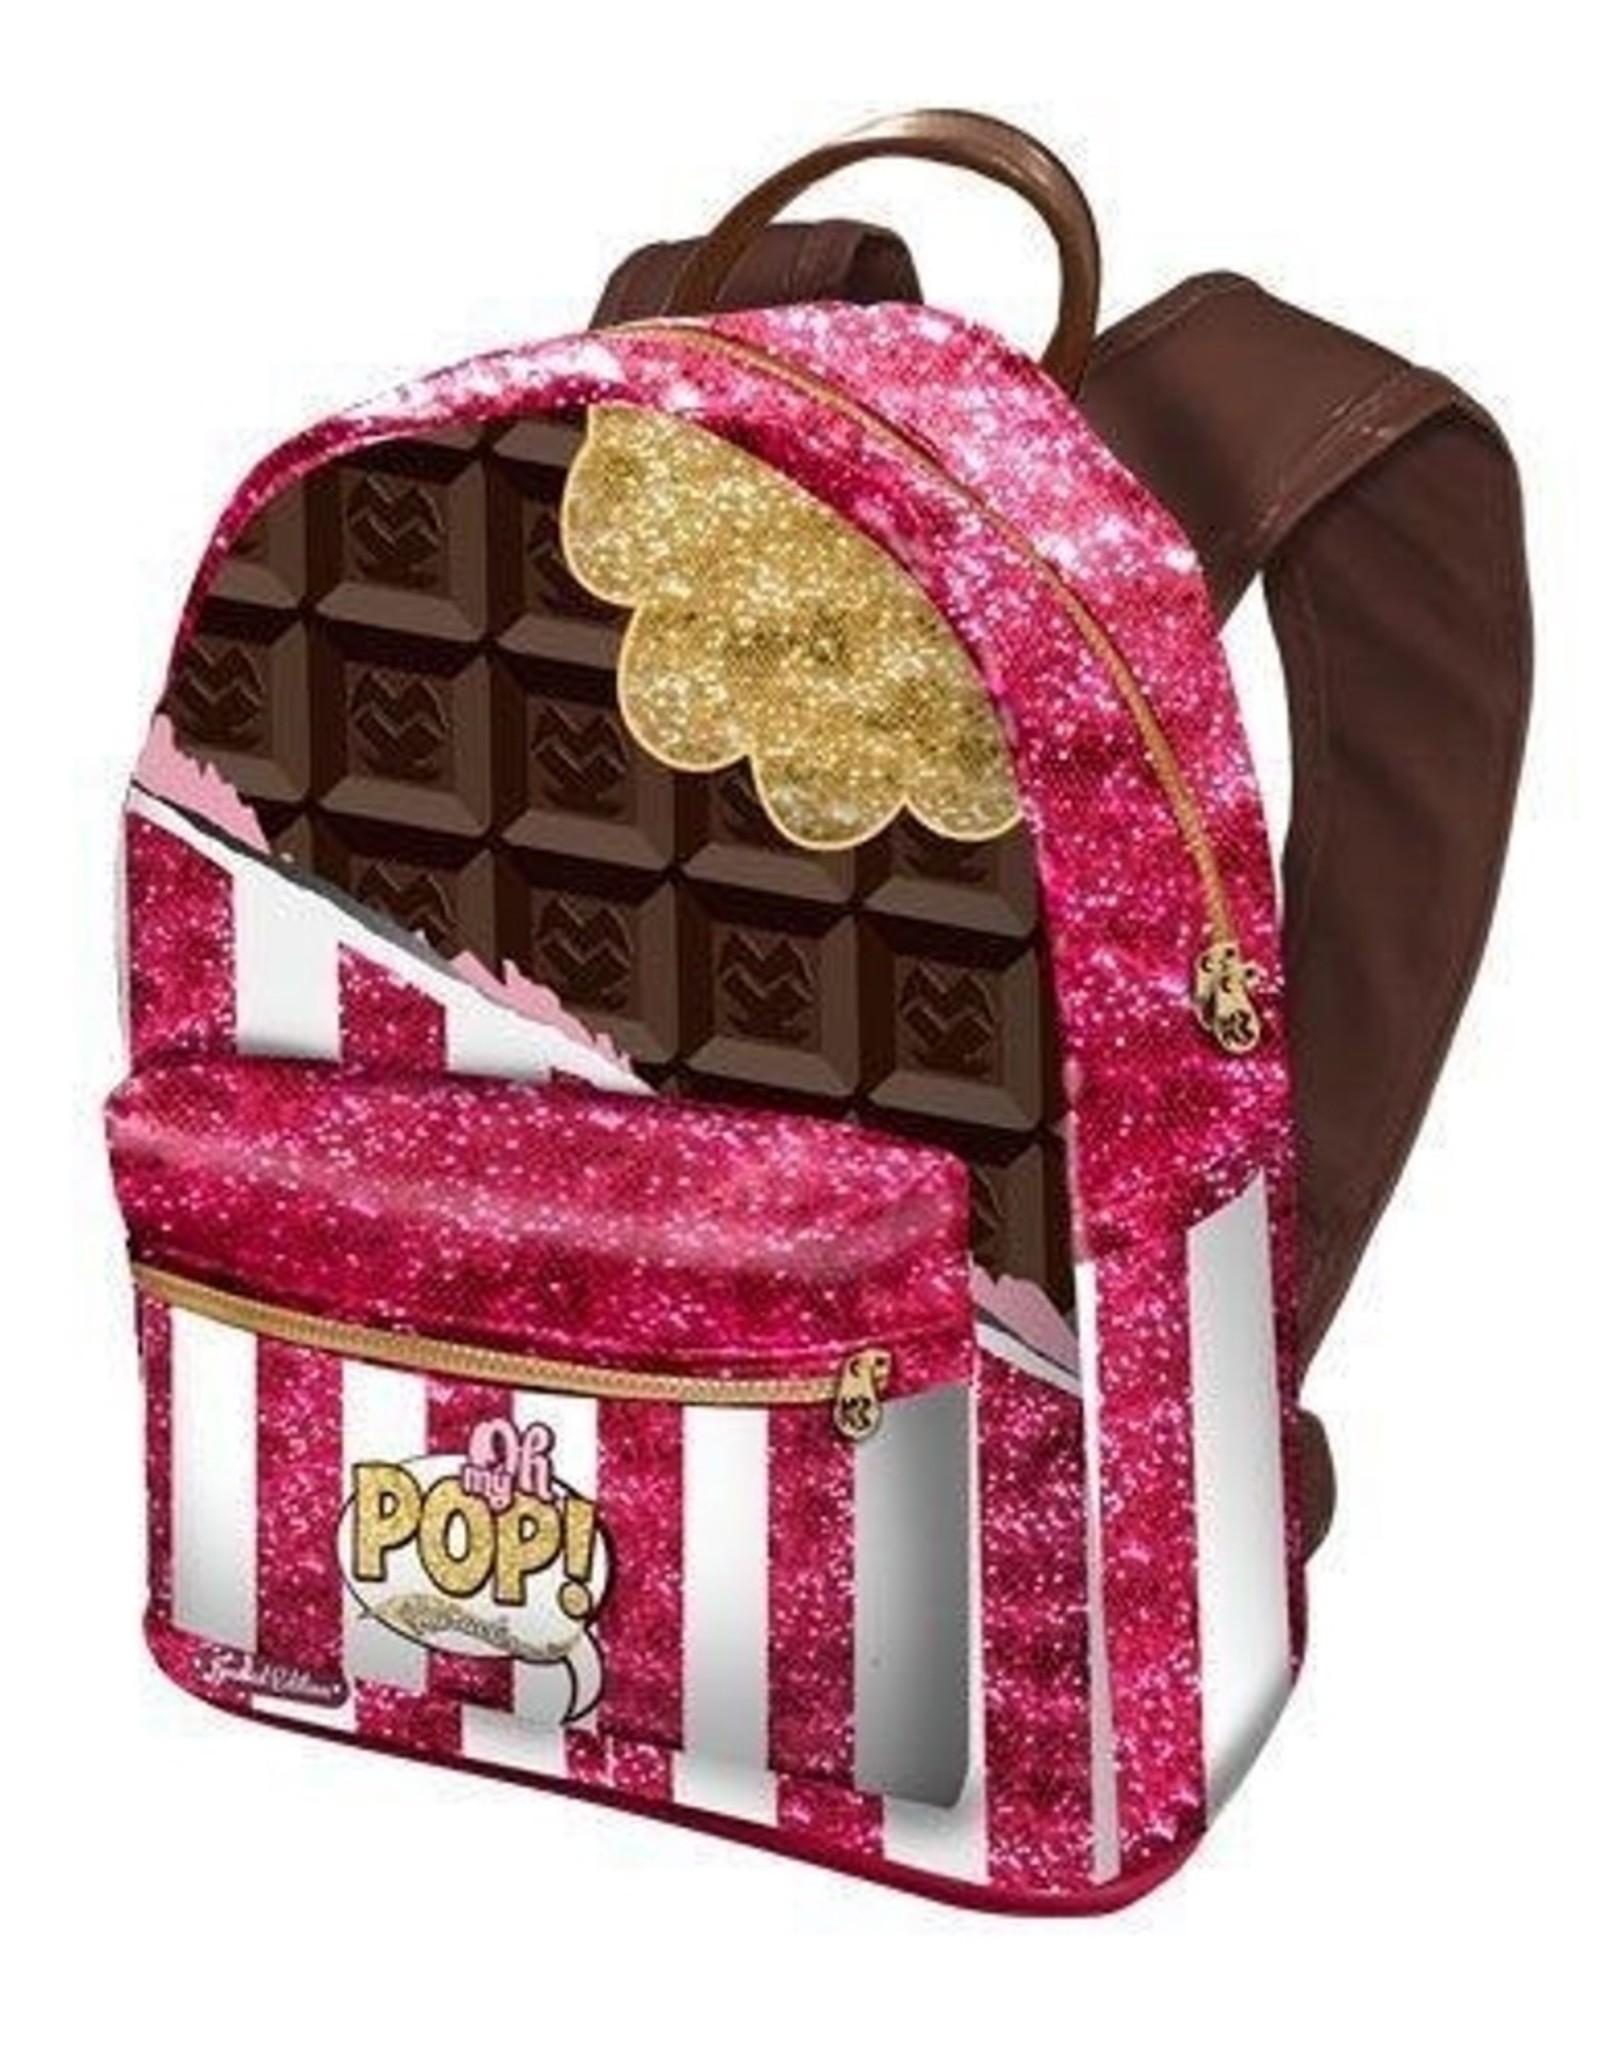 Oh my Pop! Fantasy tassen en portemonnees - Oh My Pop! Chocola rugzak